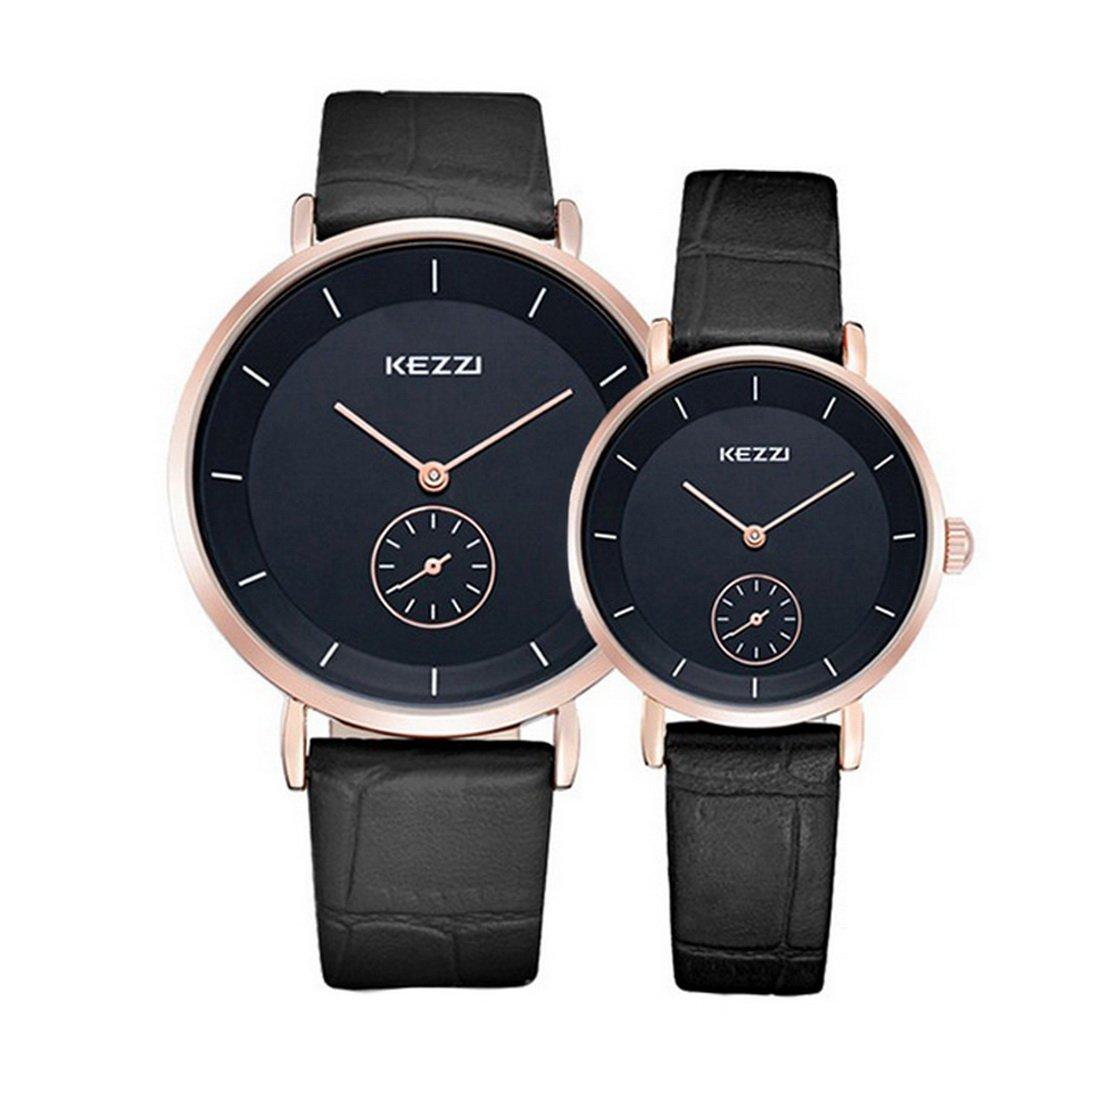 Souarts Armbanduhr 1 Paar / 2PC Leder Romantic Mode Paar Armbanduhren Schwarz